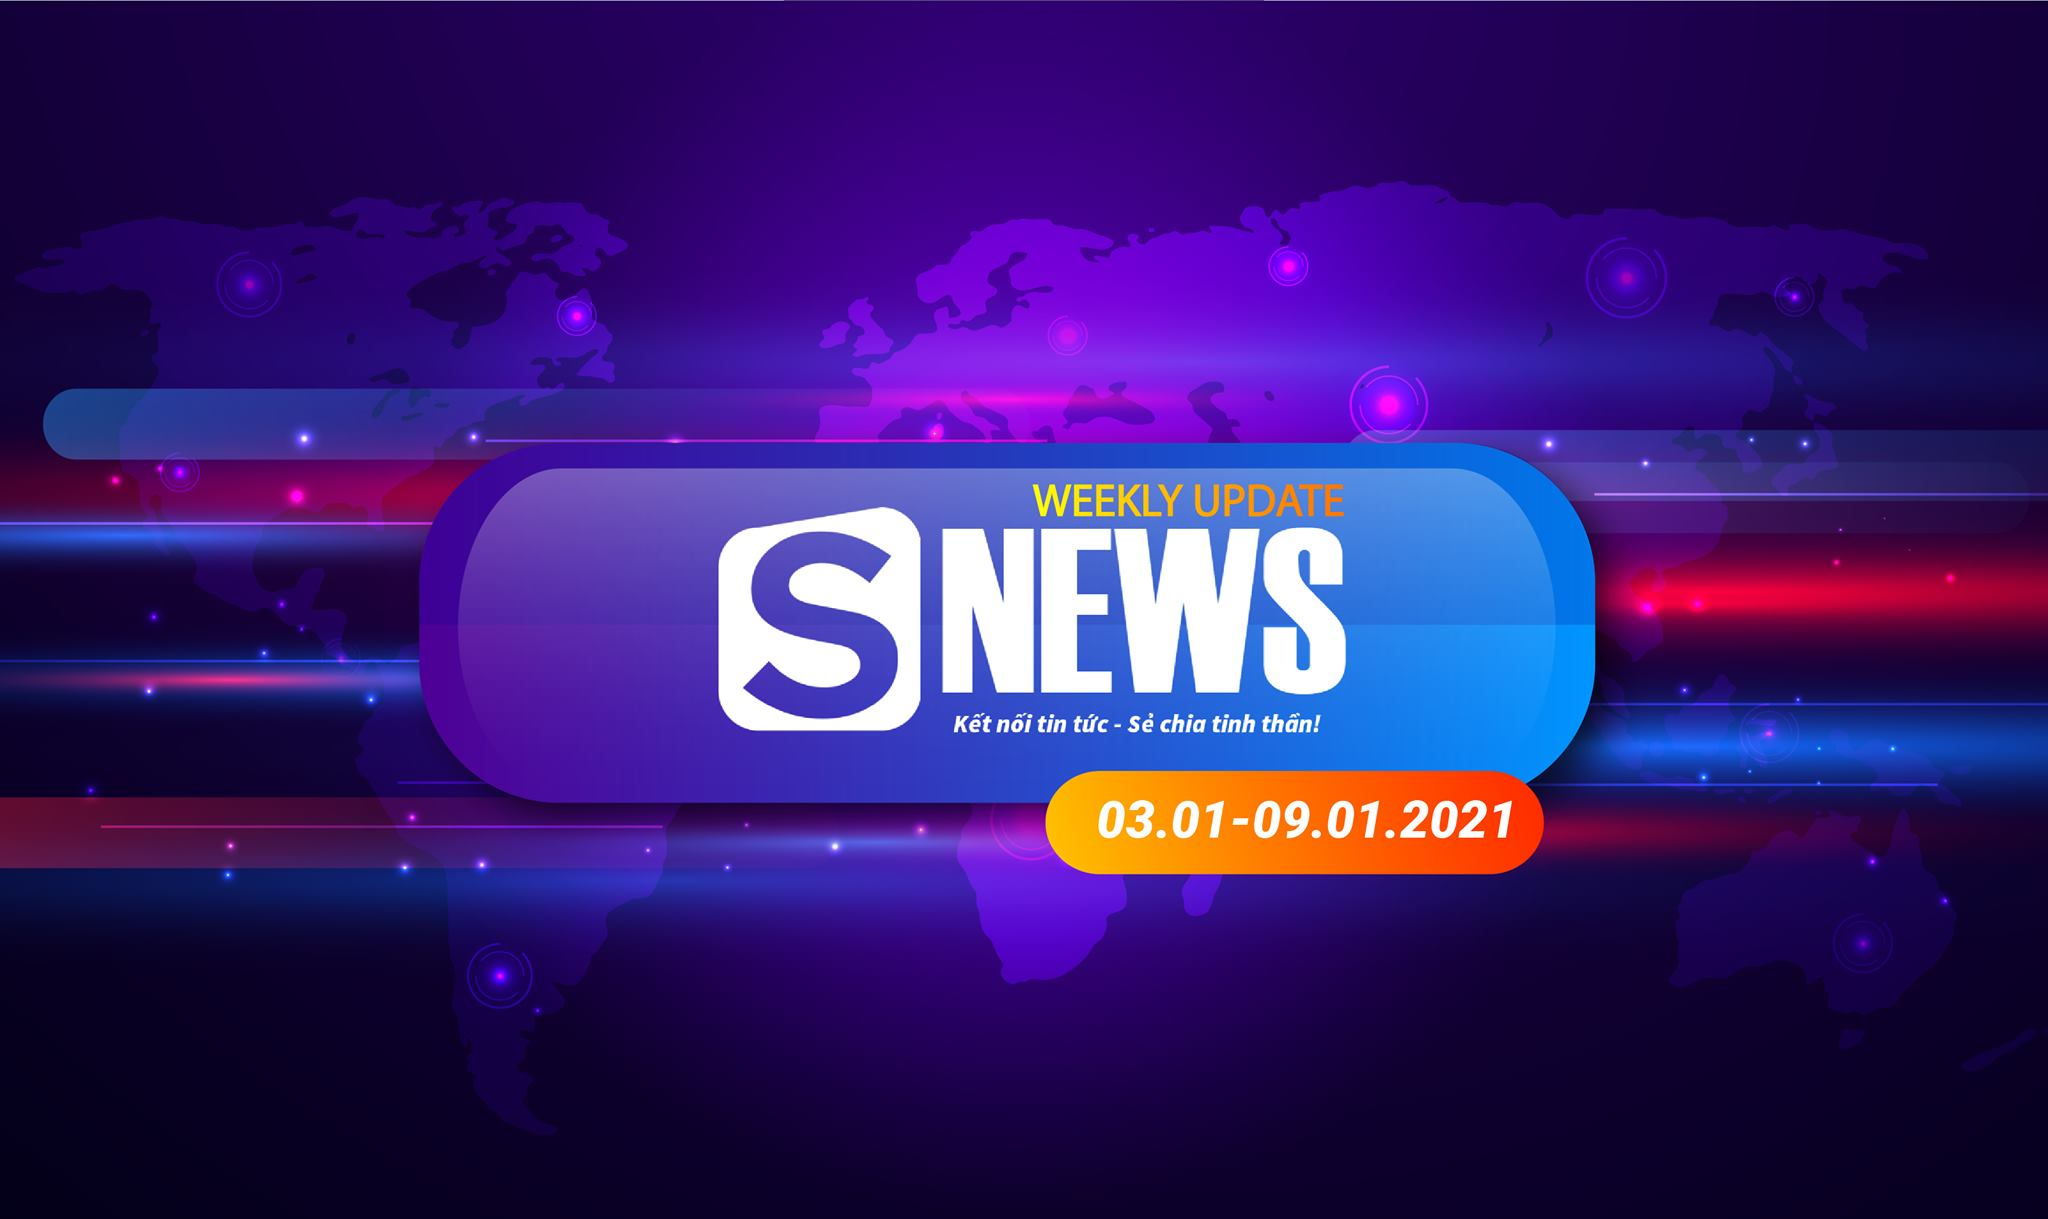 Tổng hợp tin tức Sapo tuần qua: 03.01 - 09.01.2020